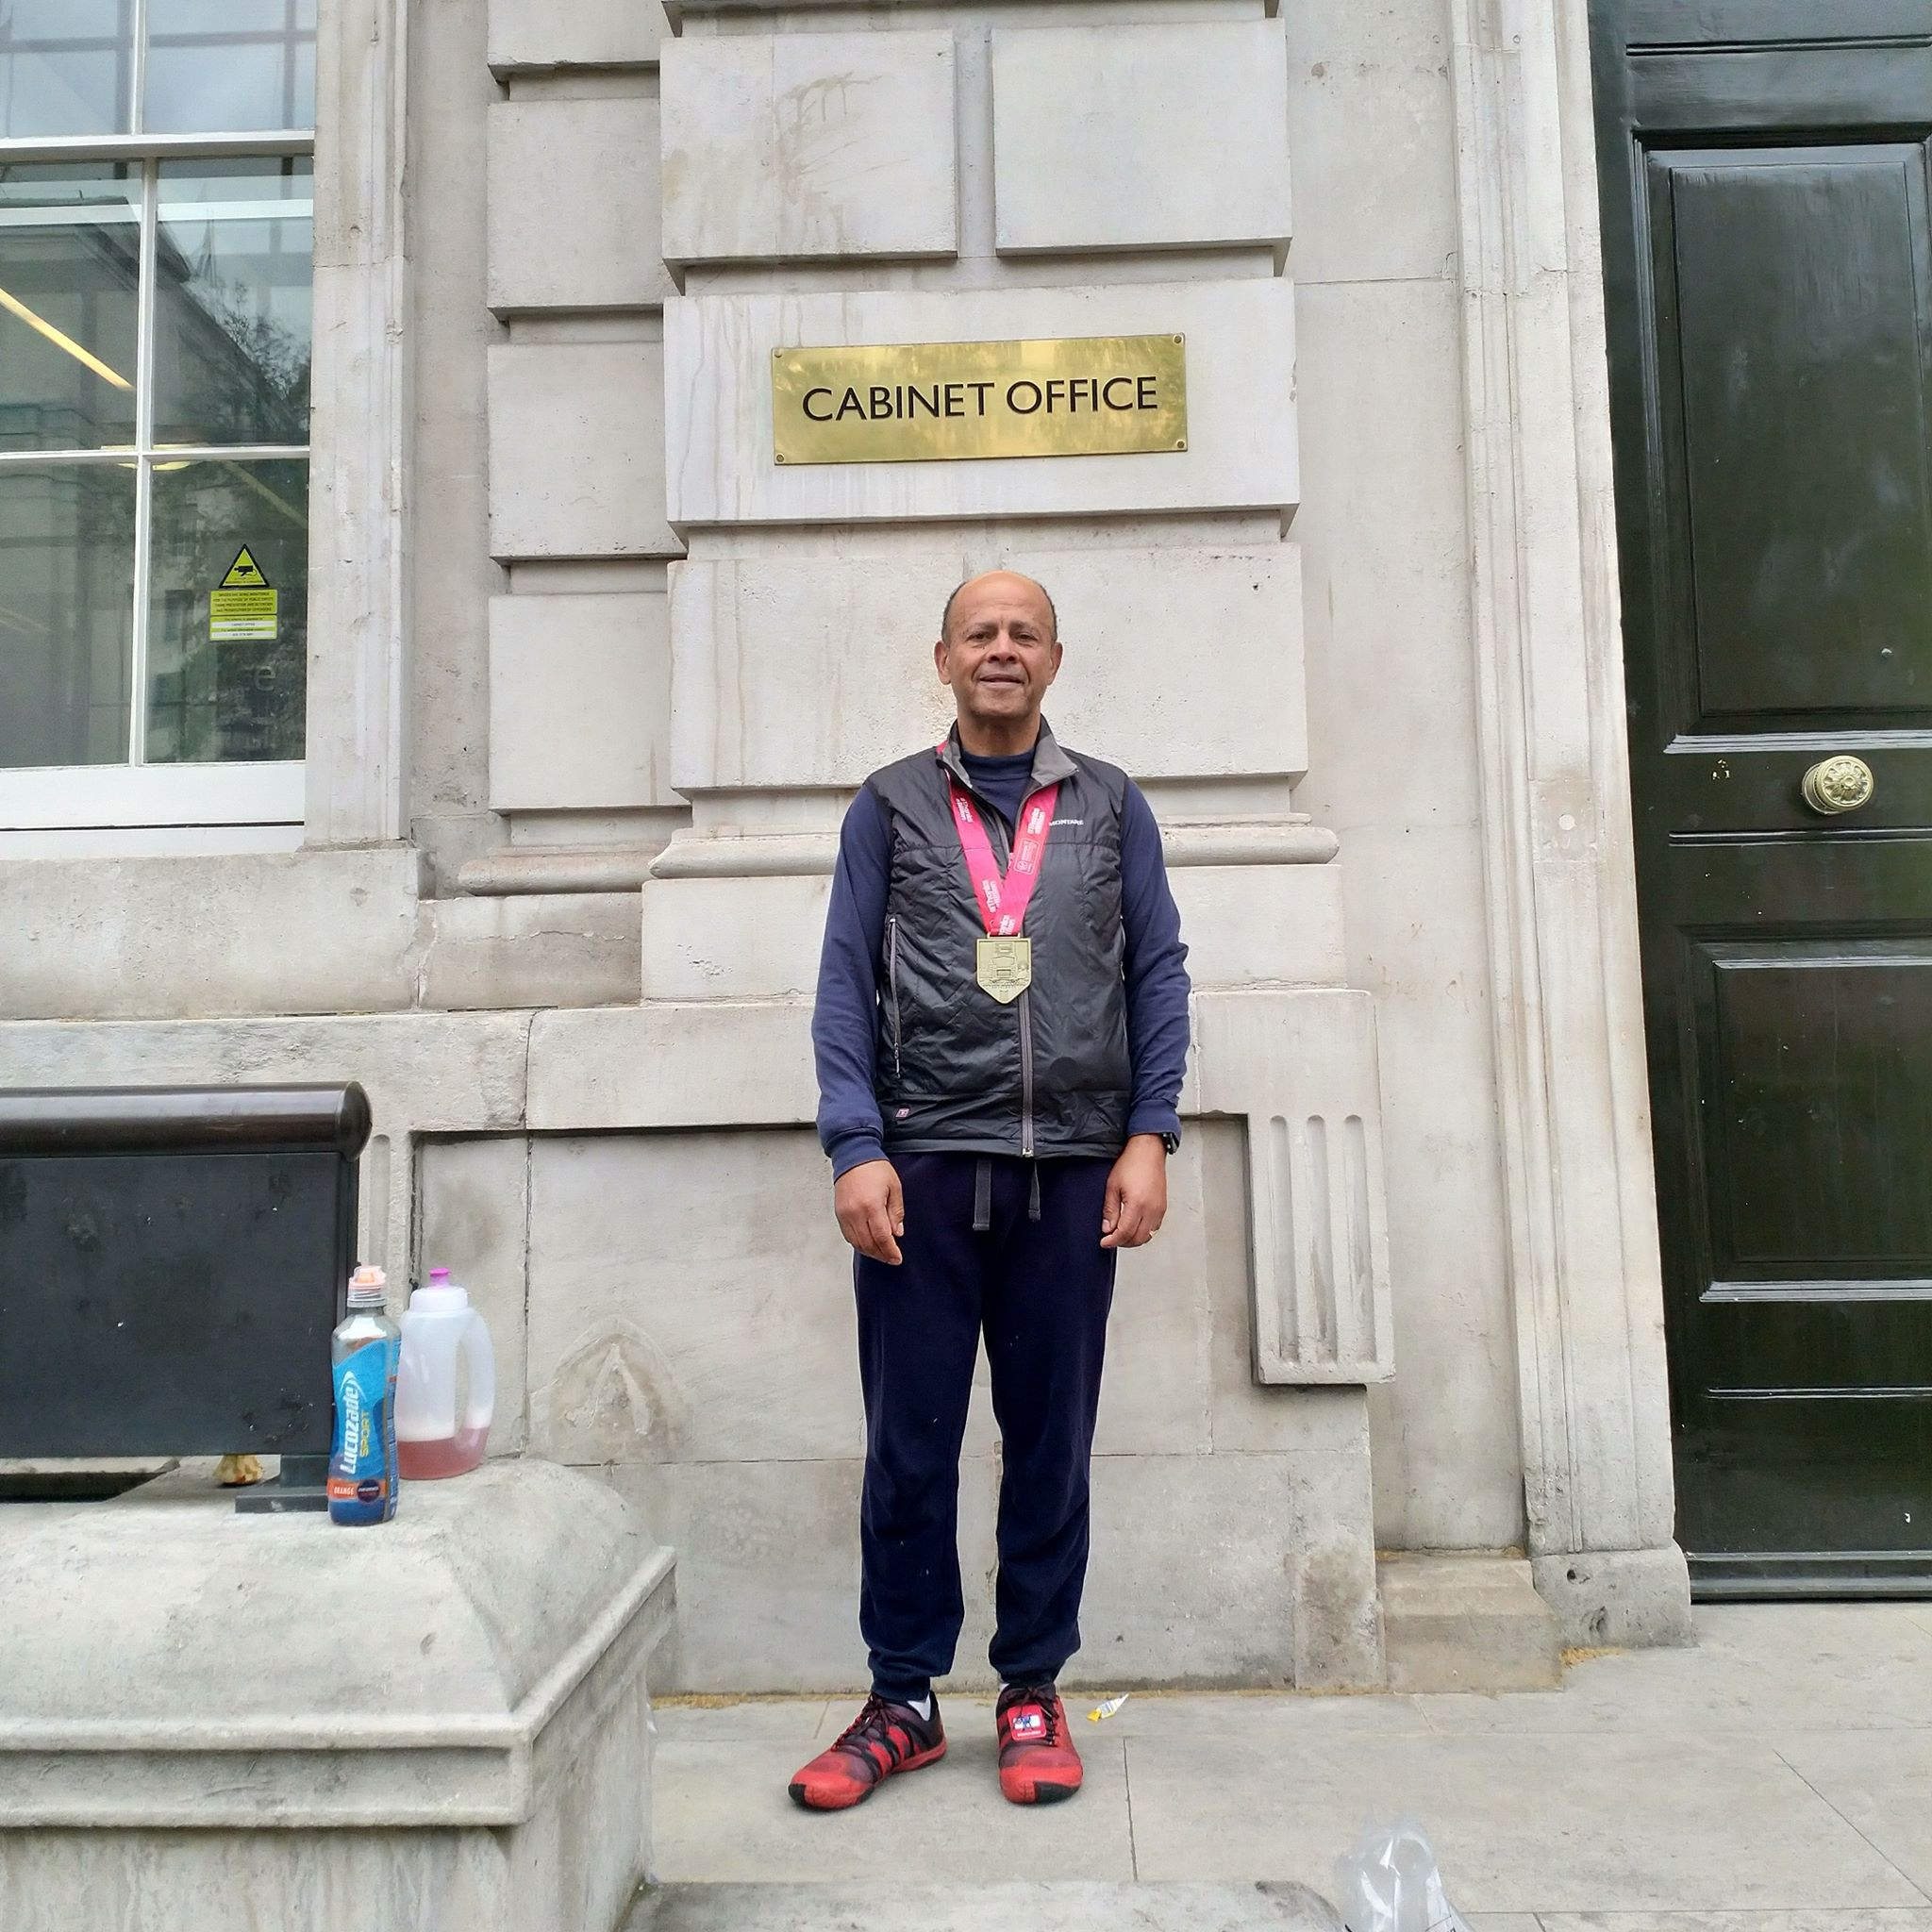 Musicians who ran the 2019 London Marathon